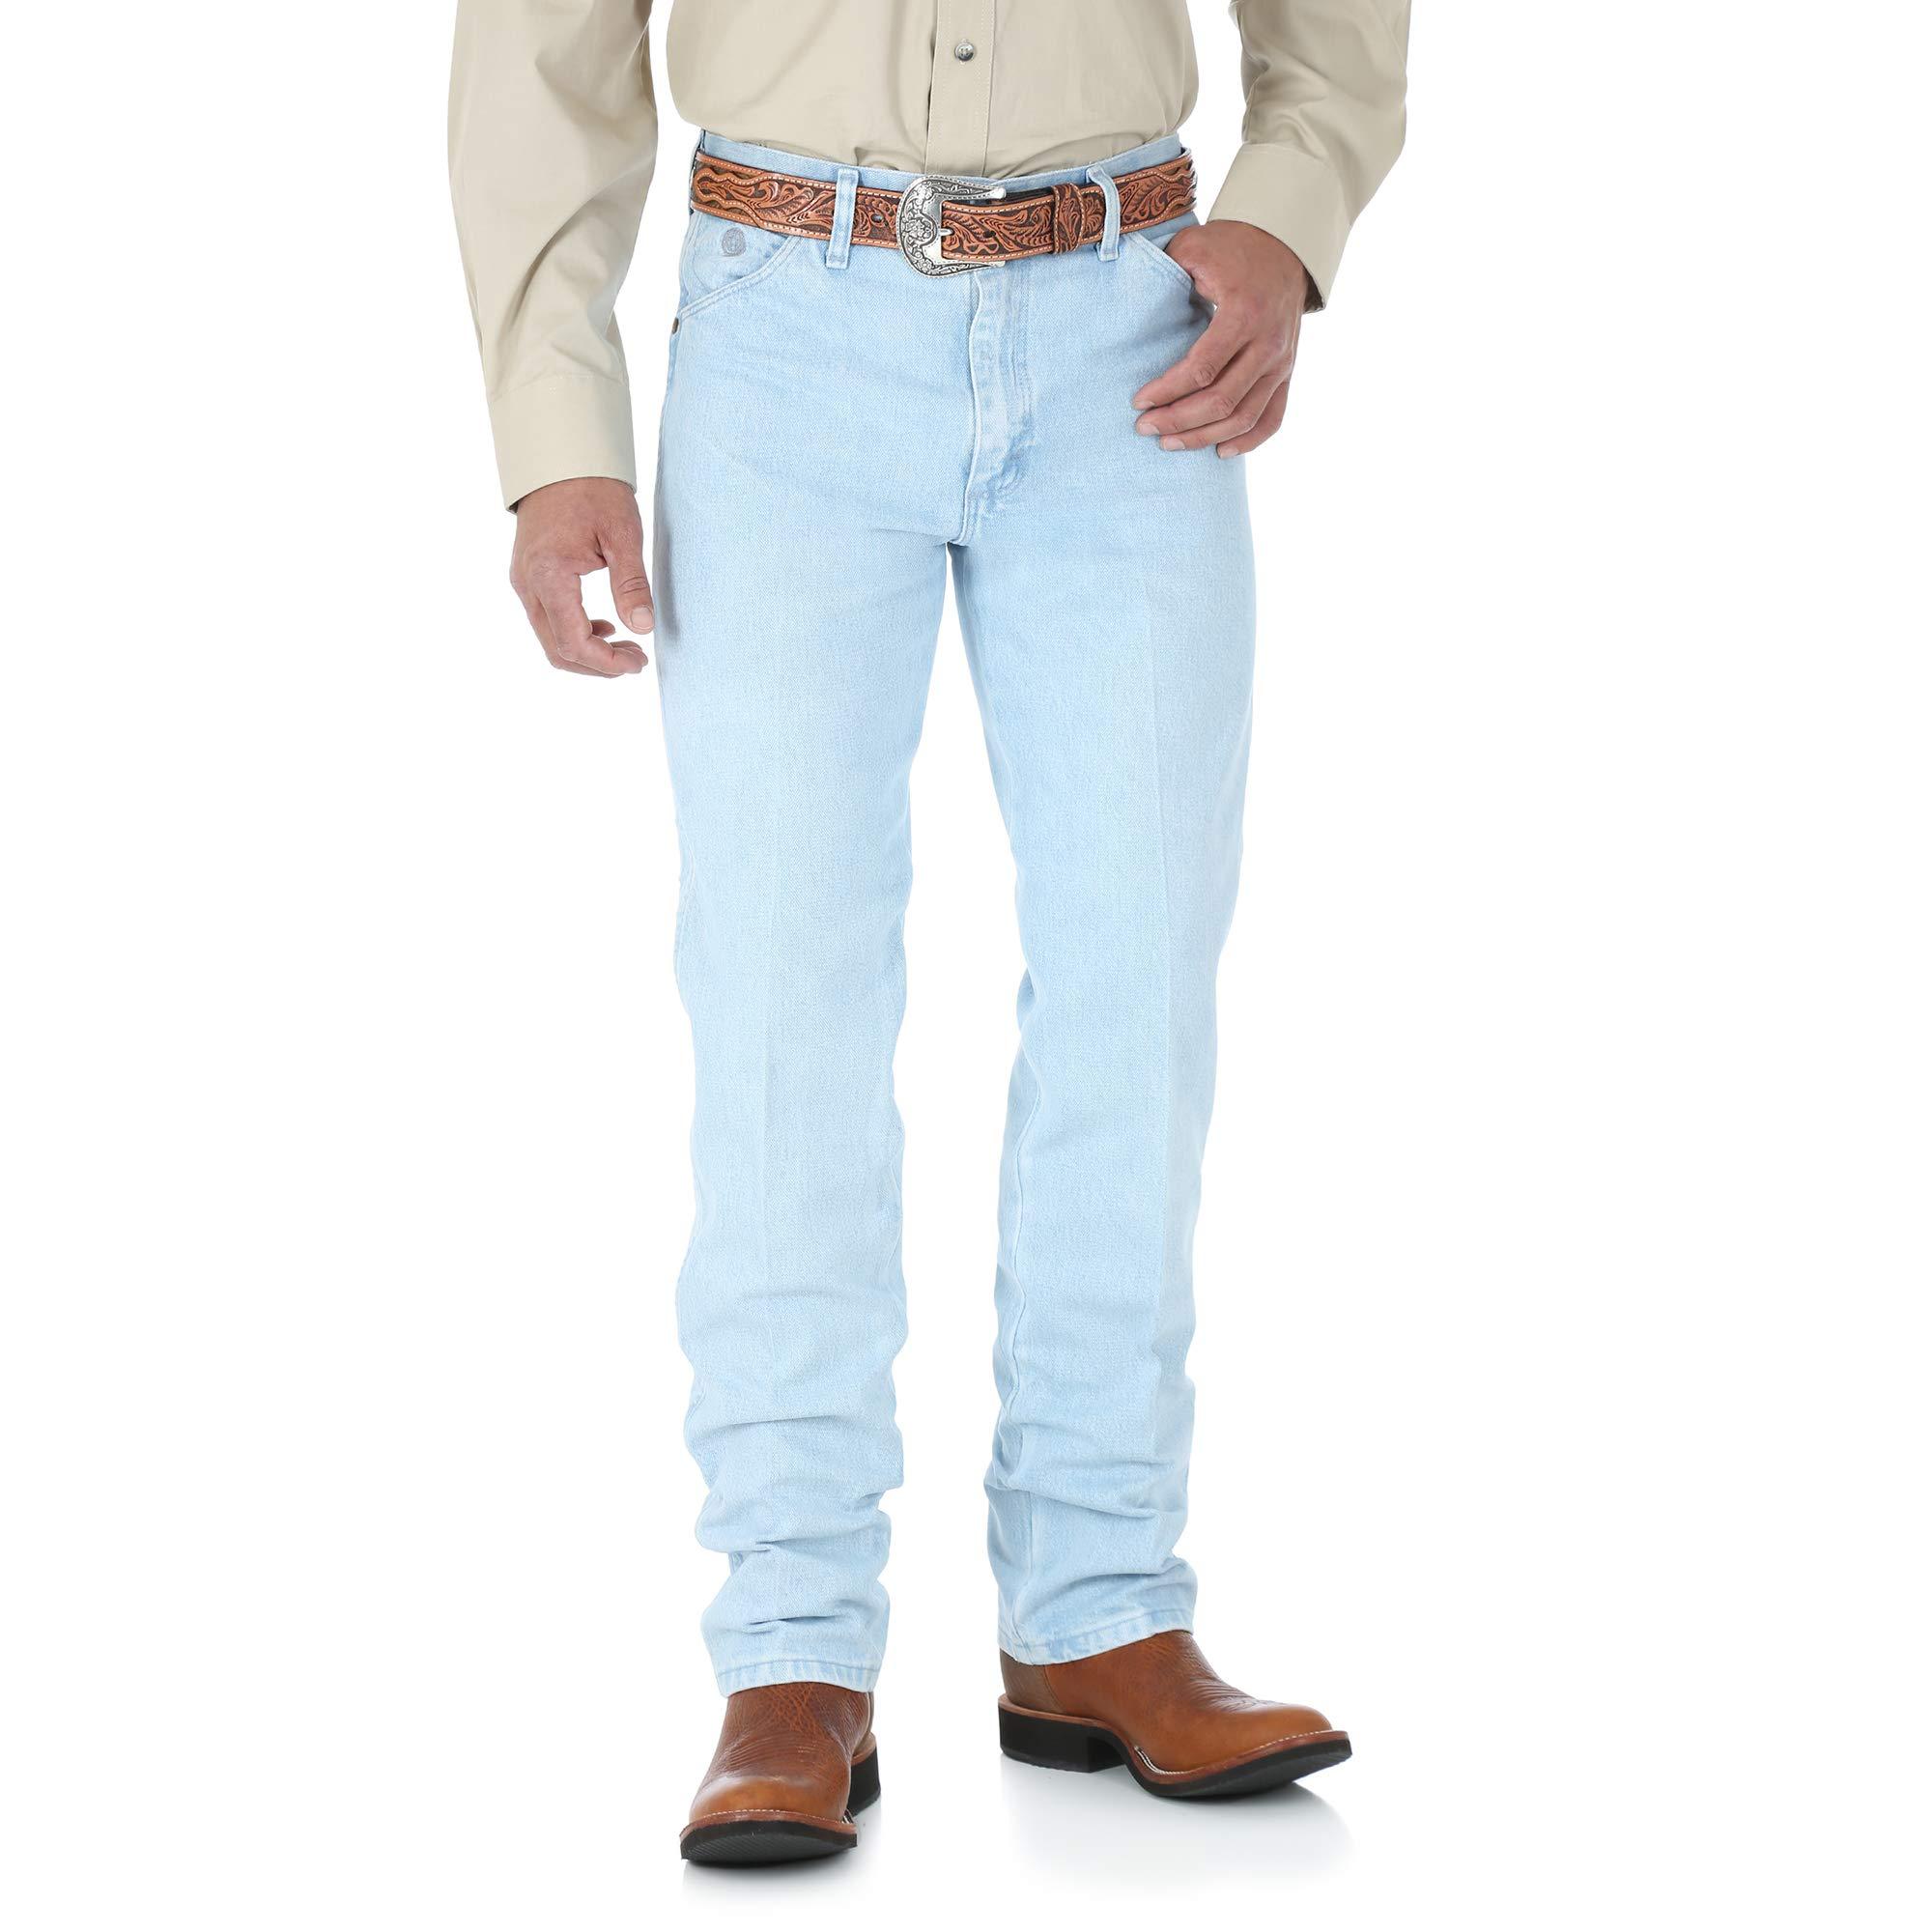 b332d562 Galleon - Wrangler Men's George Strait Cowboy Cut Original Fit Jean,  Bleach, 35W X 34L